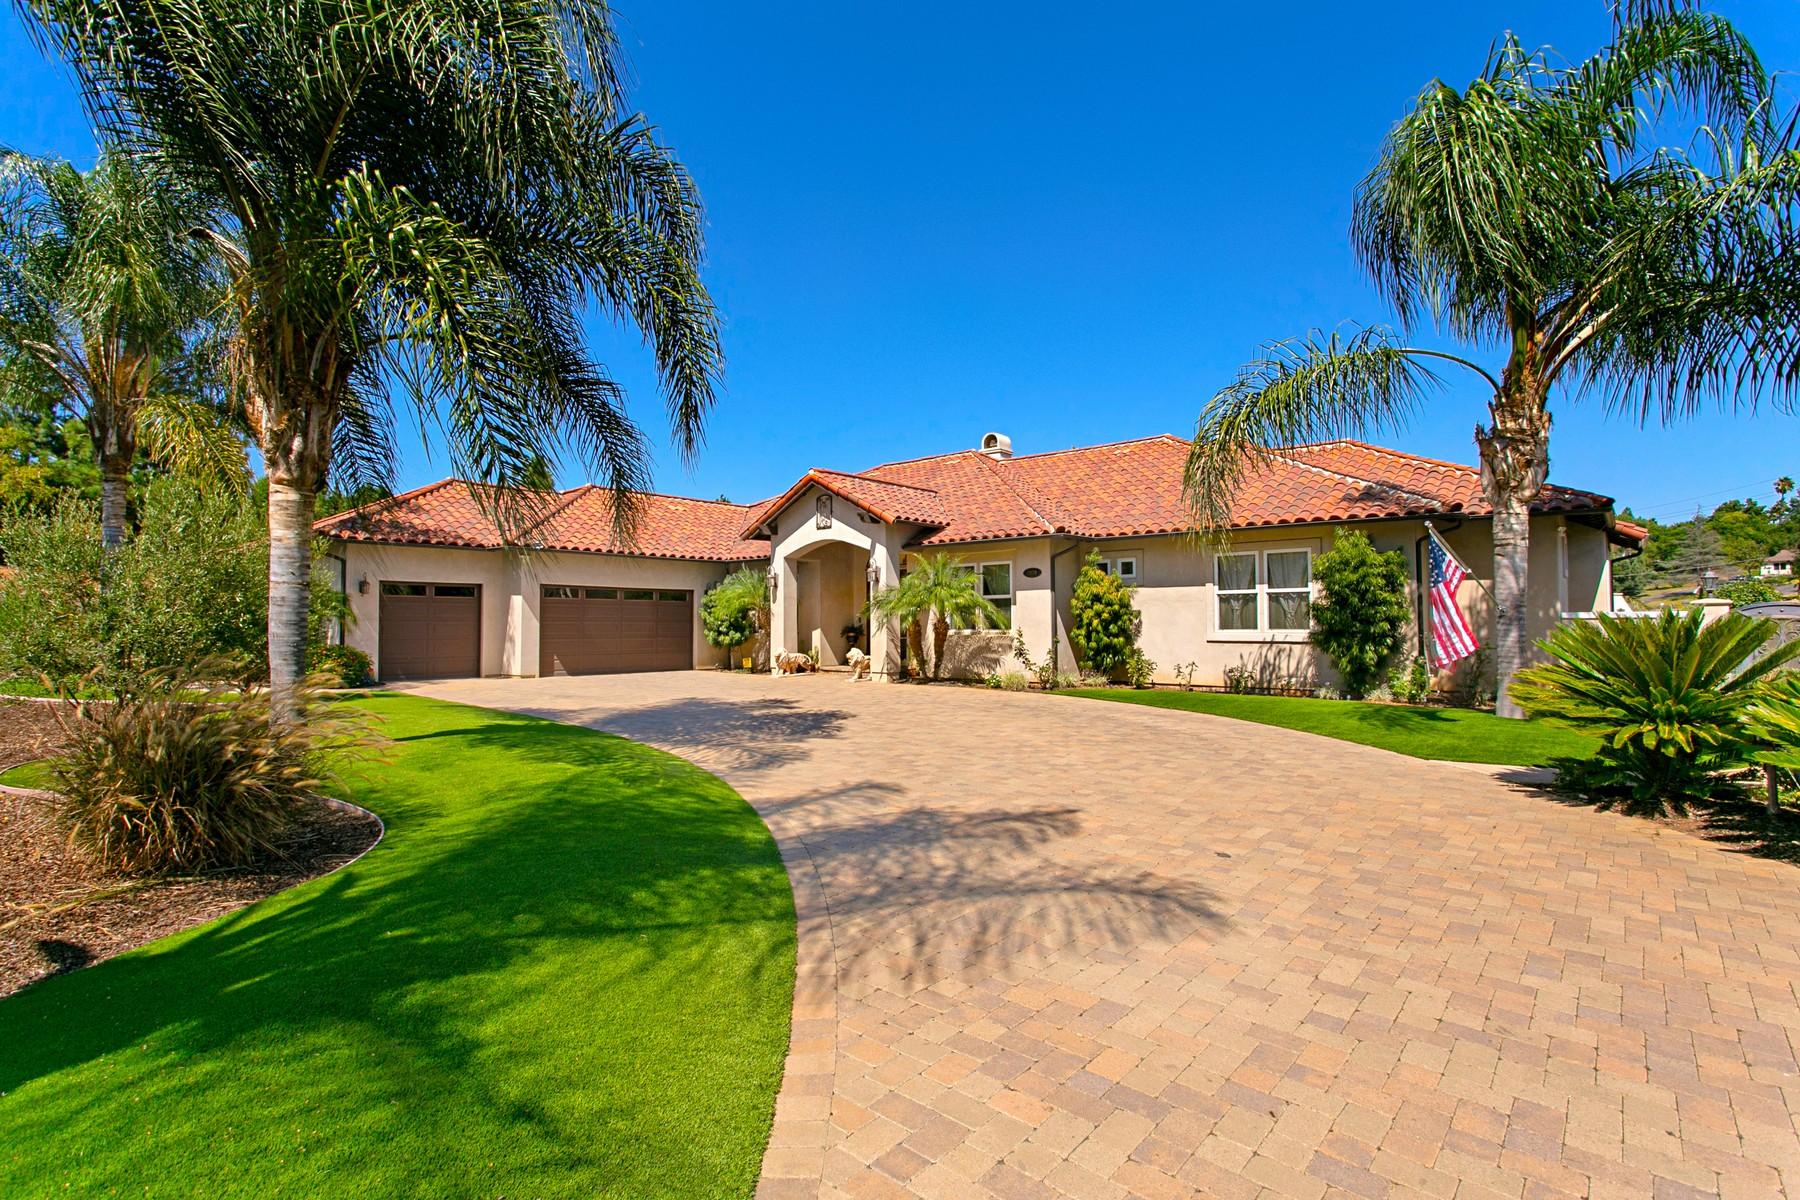 Single Family Homes for Sale at 2070 Zlatibor Ranch Road Escondido, California 92025 United States